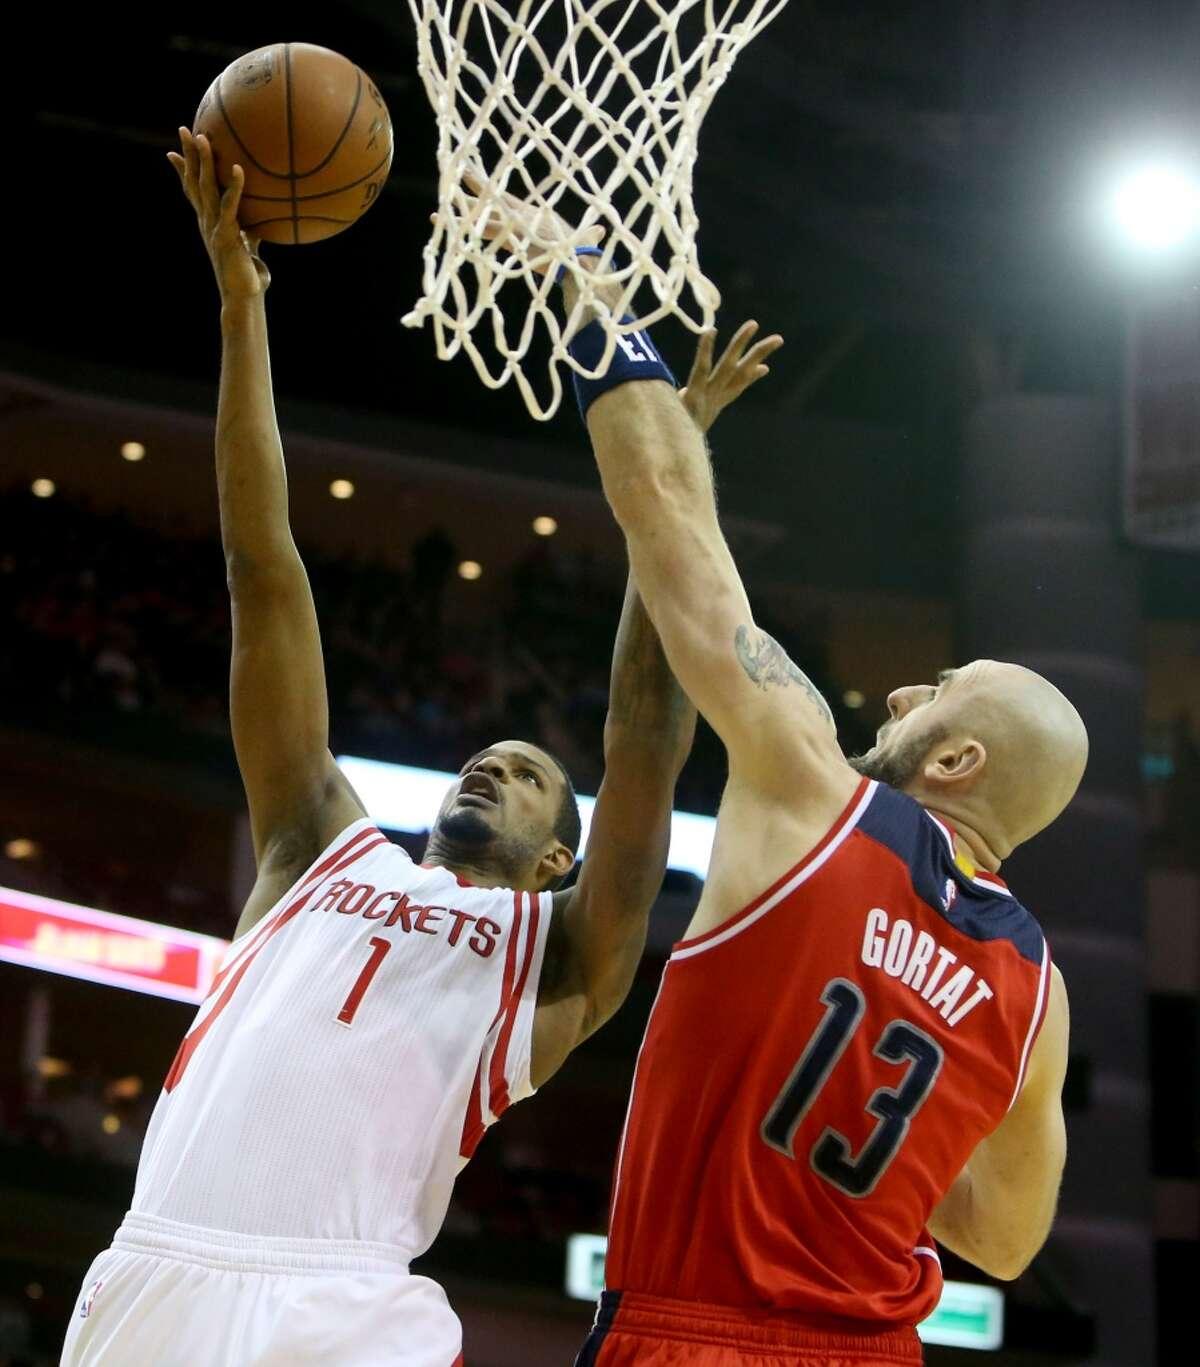 Houston Rockets forward Trevor Ariza (1) drives to the basket guarded by Washington Wizards center Marcin Gortat (13) during the first quarter at the Toyota Center Saturday, Jan. 30, 2016, in Houston, Texas. ( Gary Coronado / Houston Chronicle )